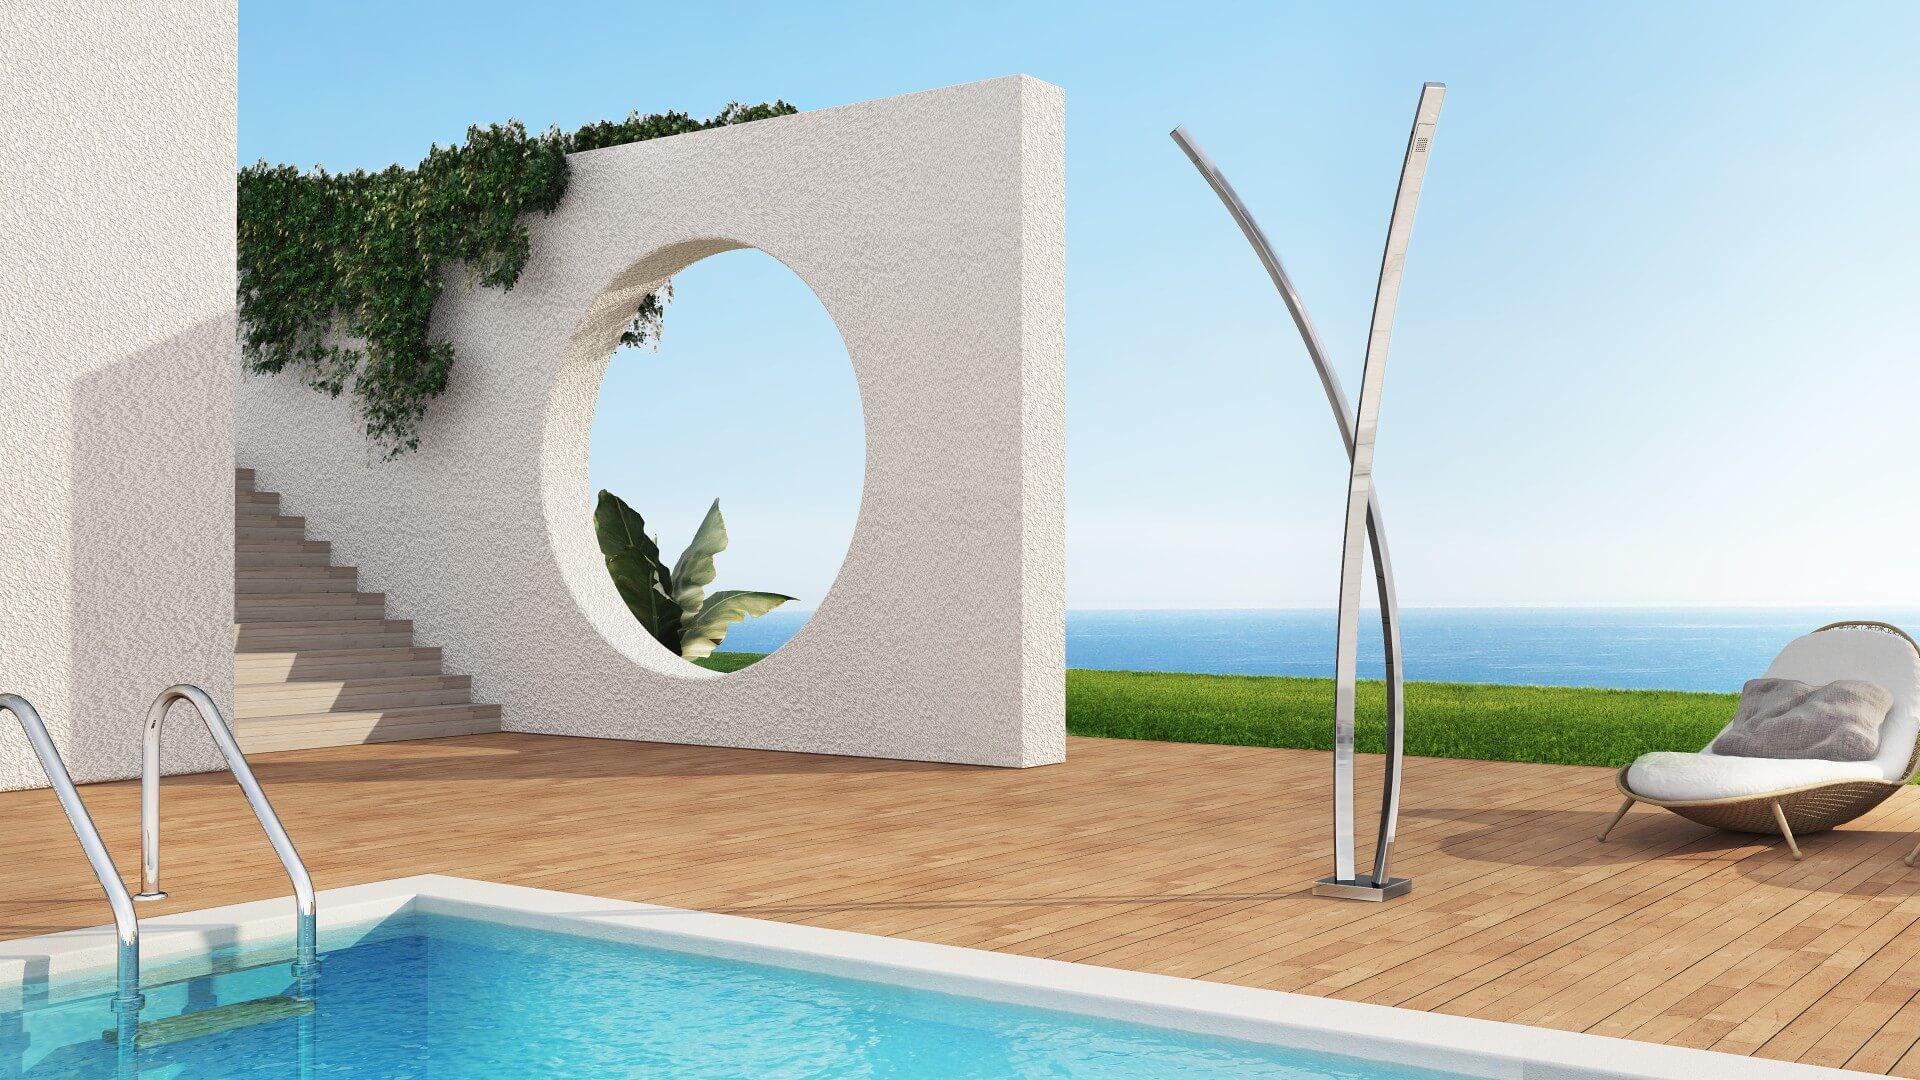 Photo douche extérieure, piscine, jardin - Preludio Inoxstyle